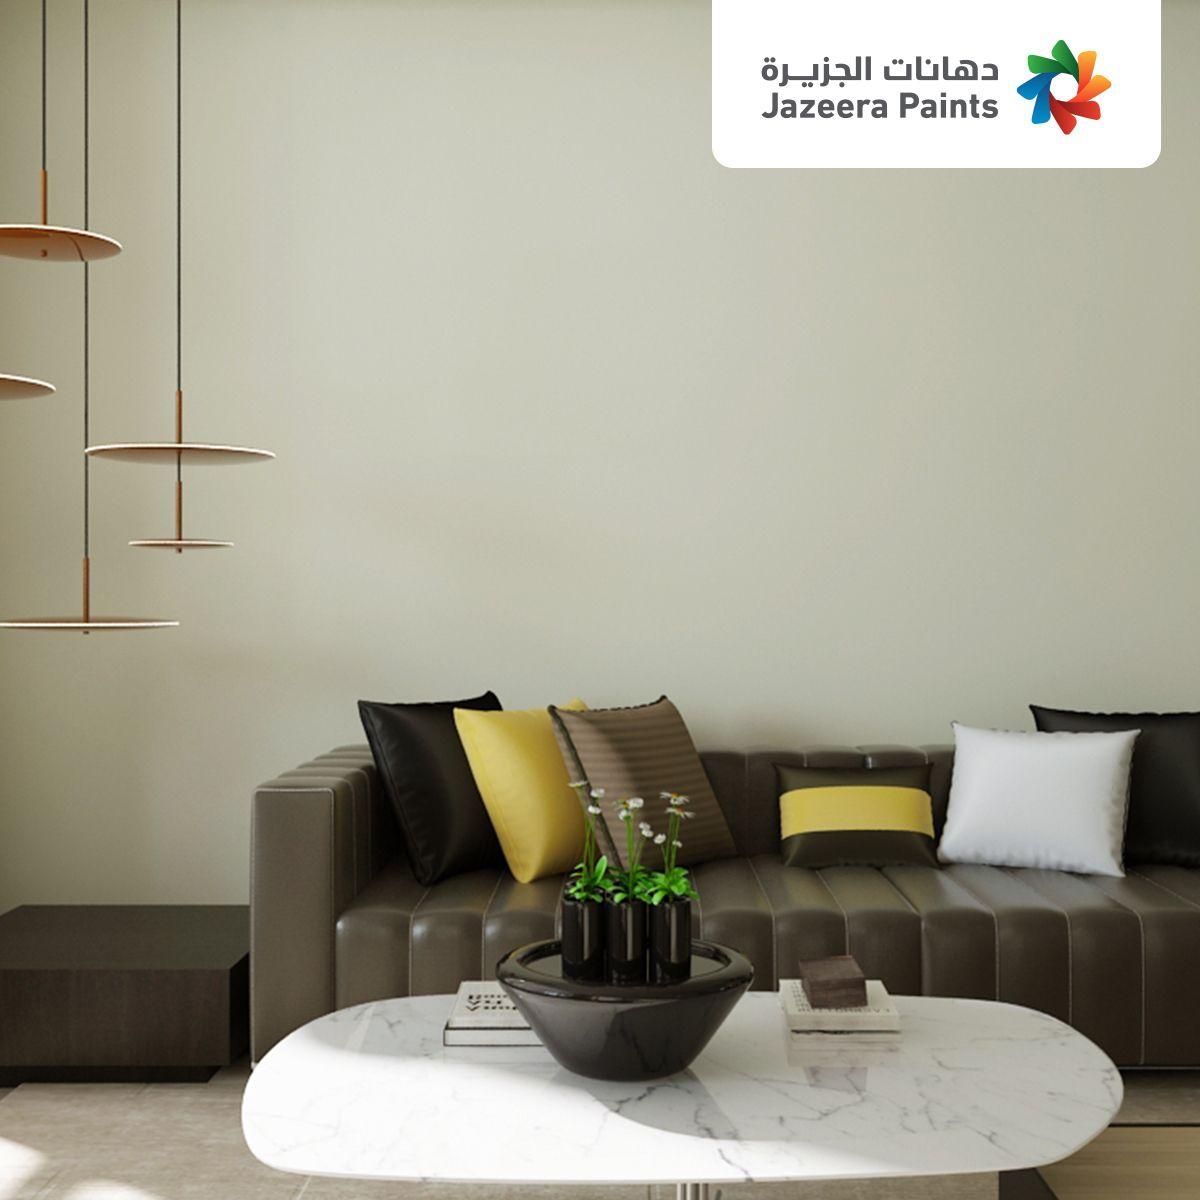 لون ندى العسل Coffee Table Decor Home Decor